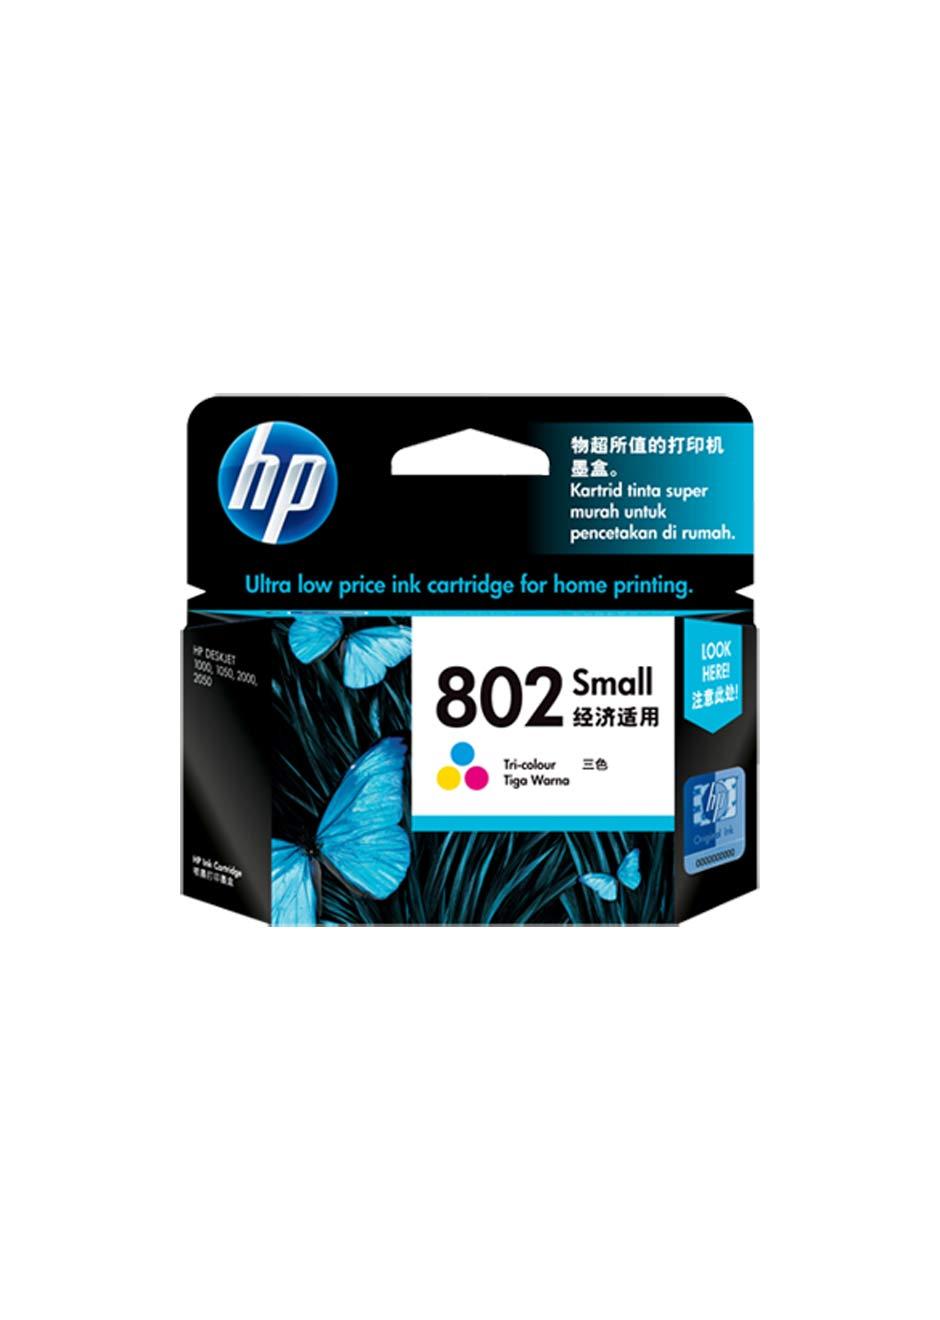 HP-802-color